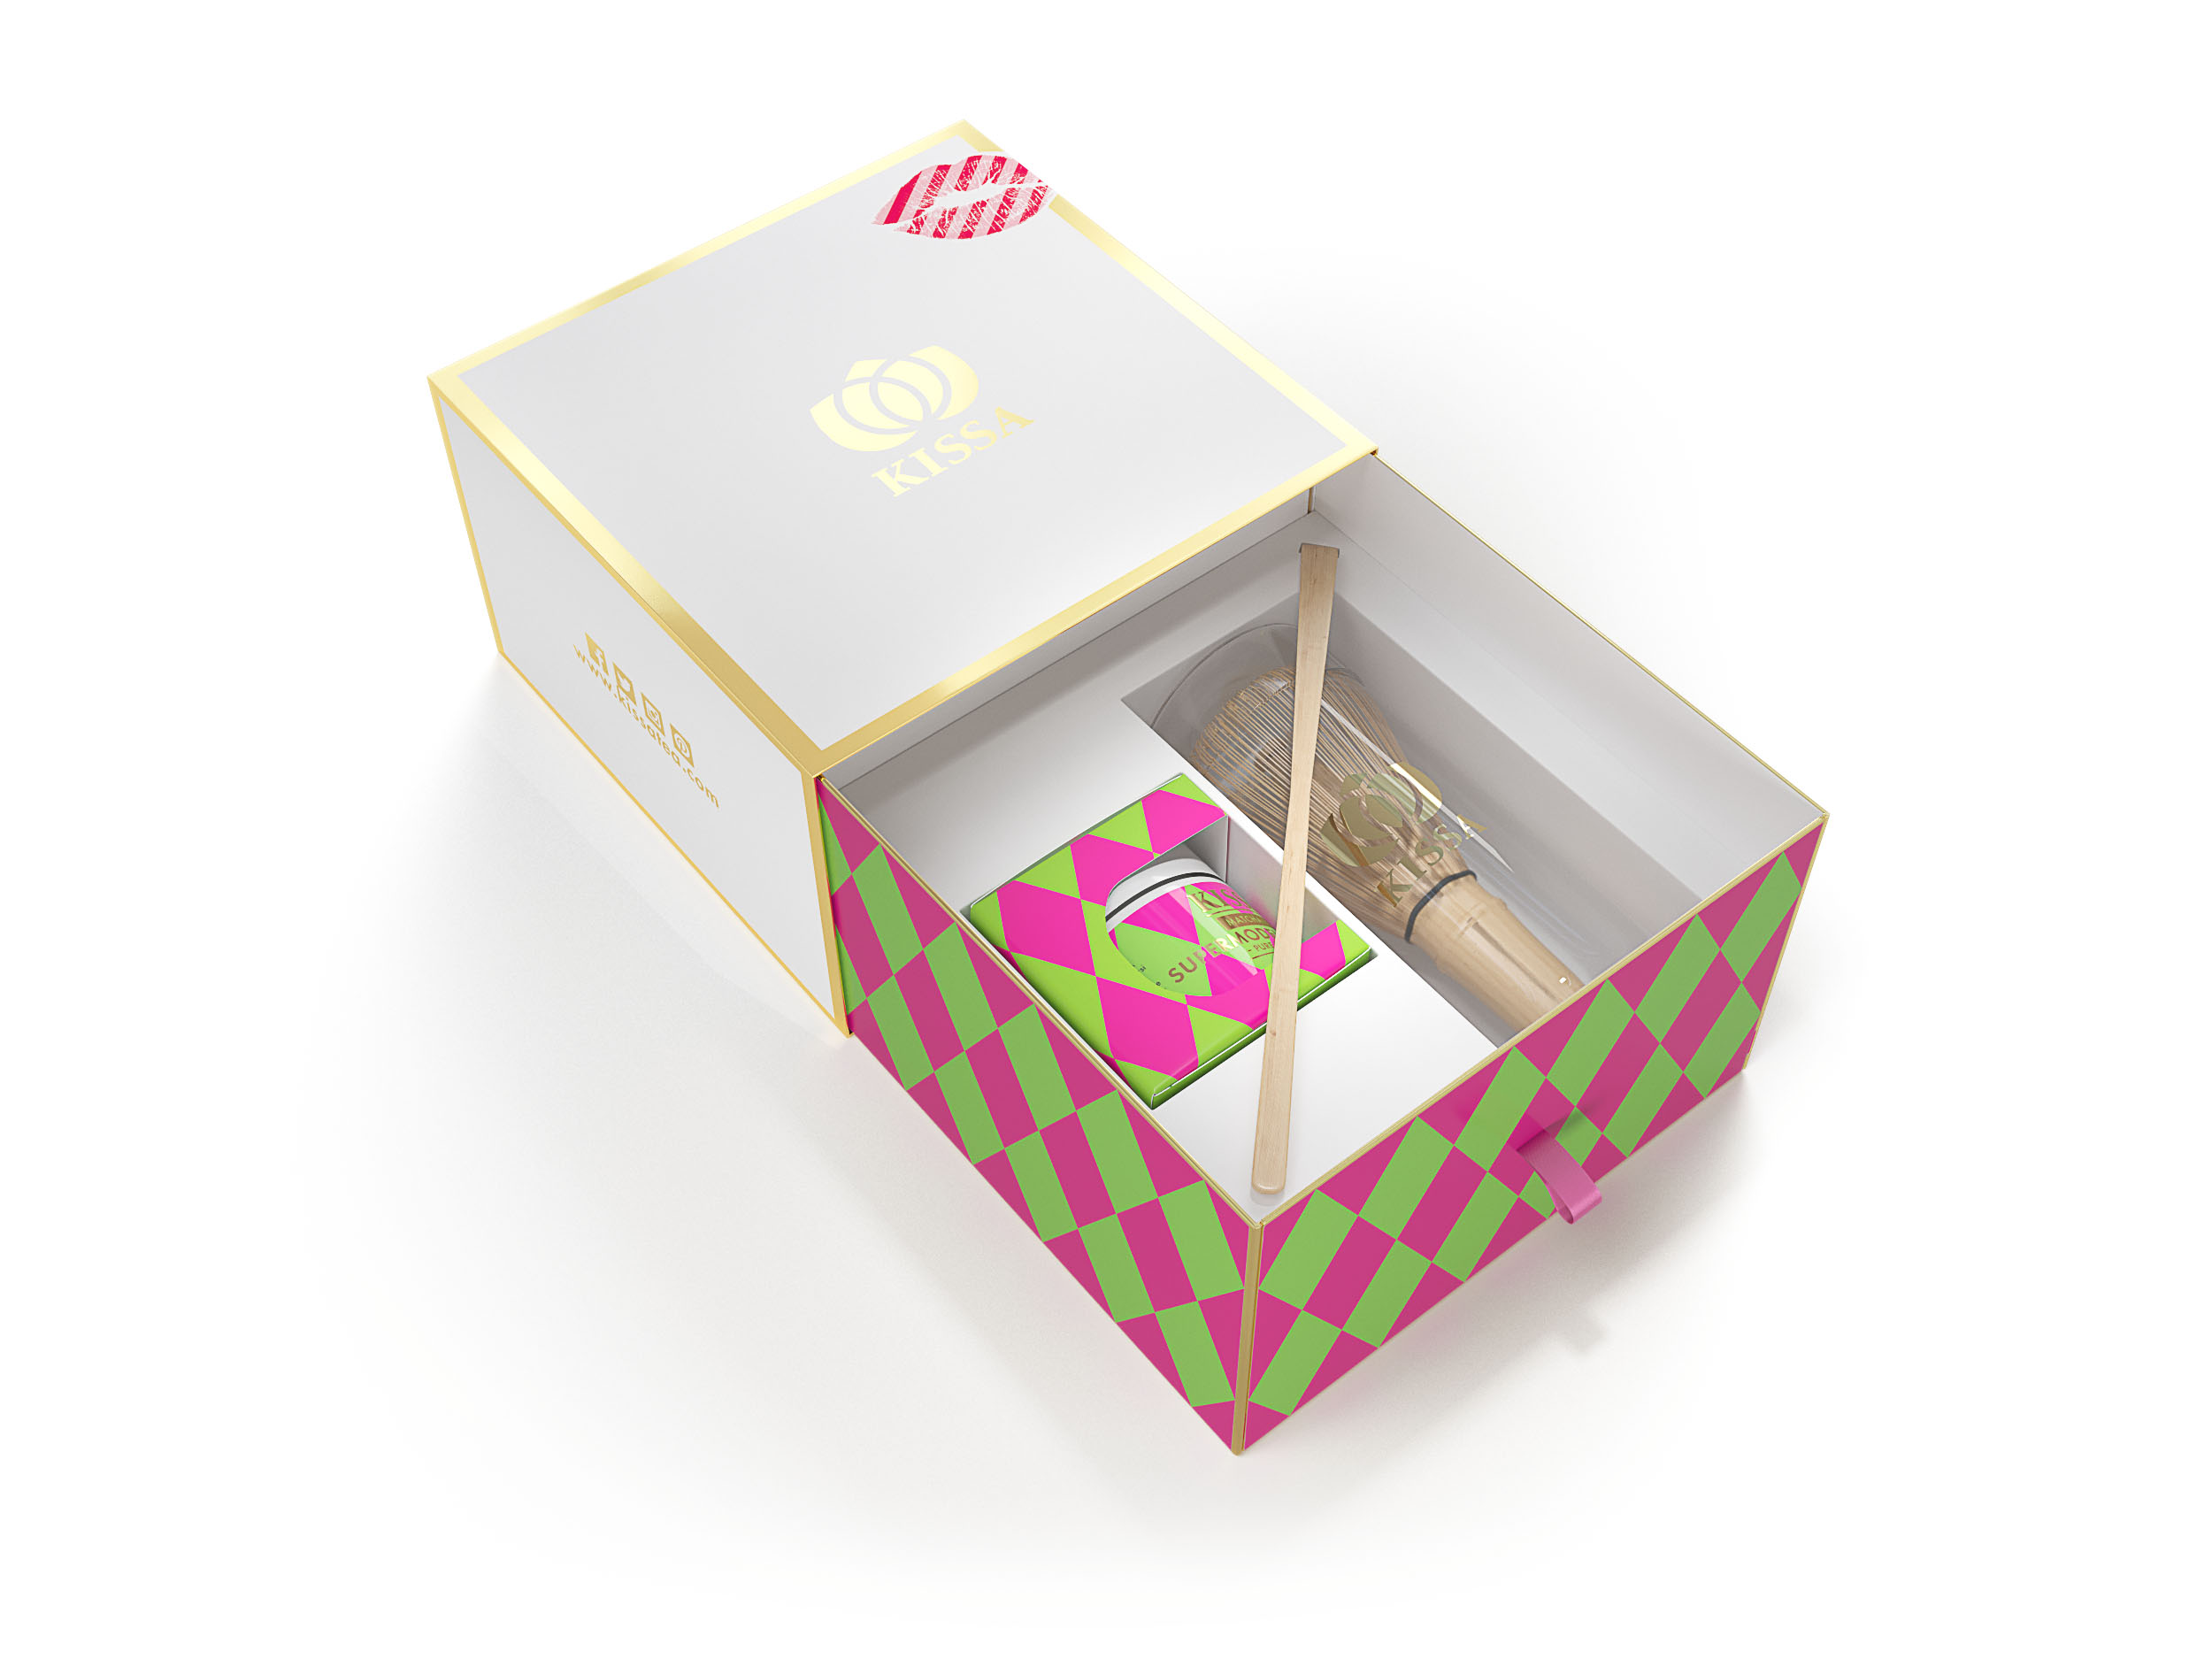 kissa-tea-weihnachtsgeschenkset_offen_supermodels-secret_bambusbesen_bambusloeffel_eur32